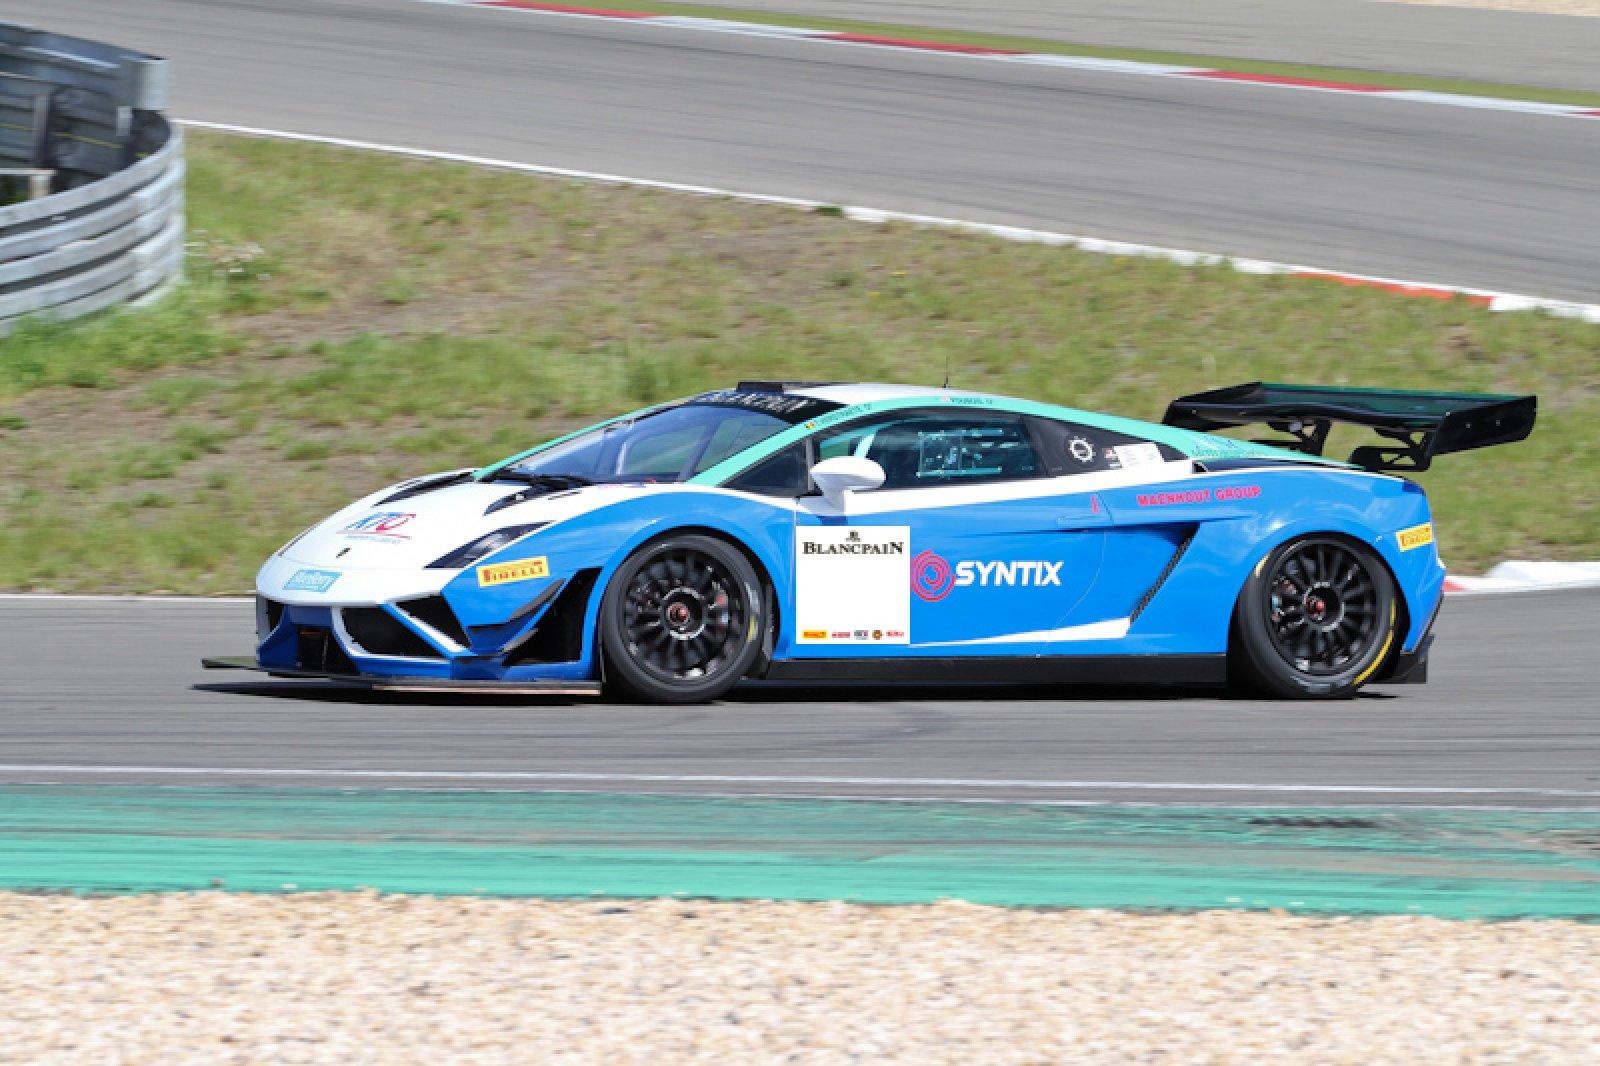 NSC Motorsports joins Blancpain Sprint Series in Zolder